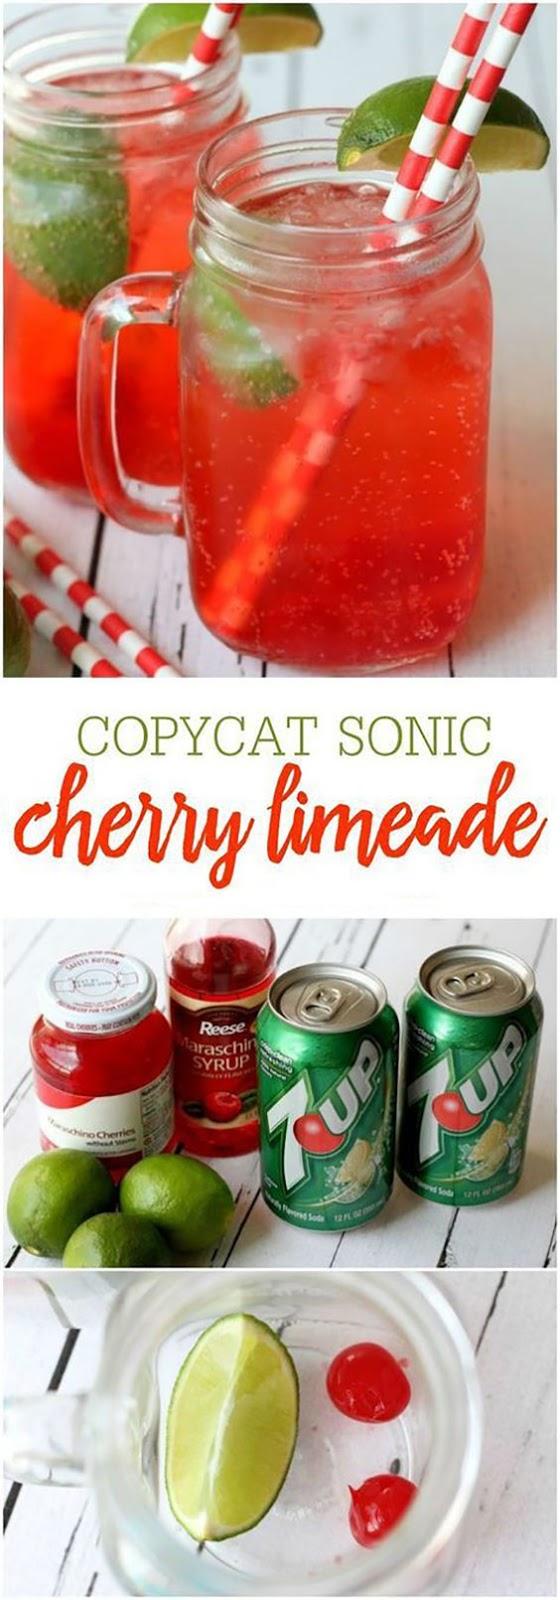 Copycat Sonic Cherry Limeade Recipe